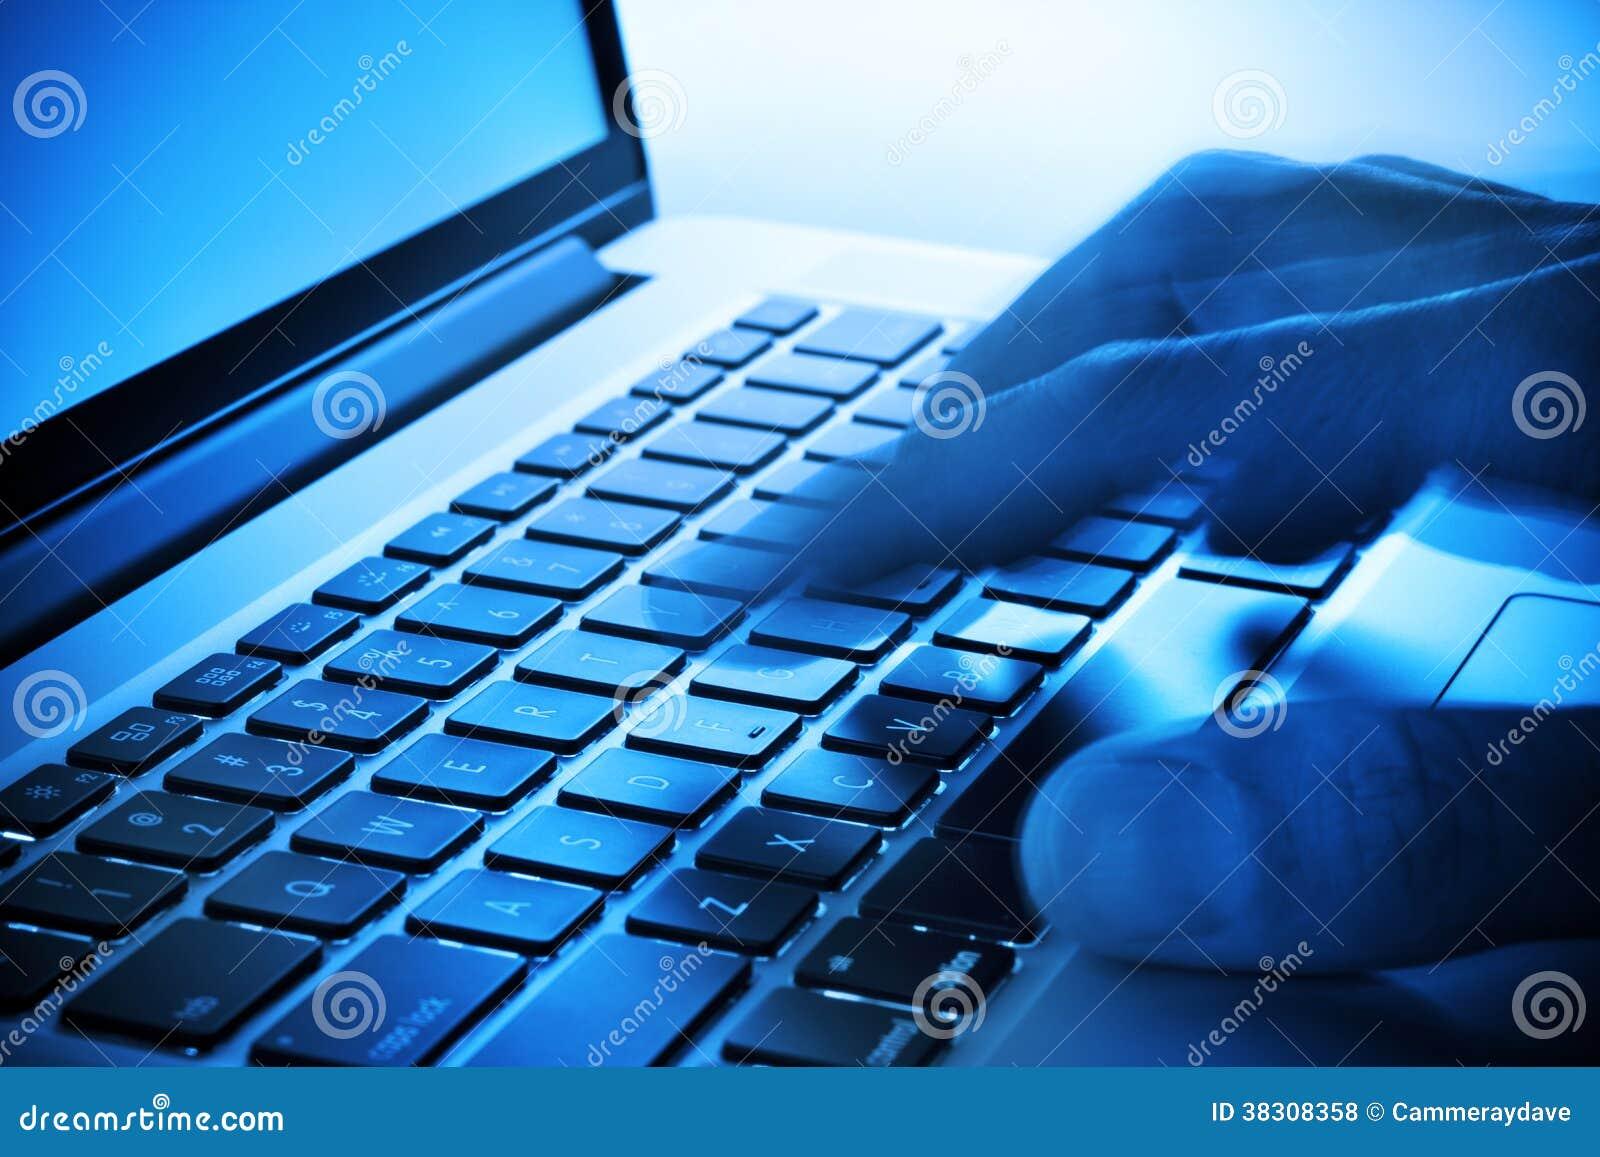 Hand Keyboard Computer Business